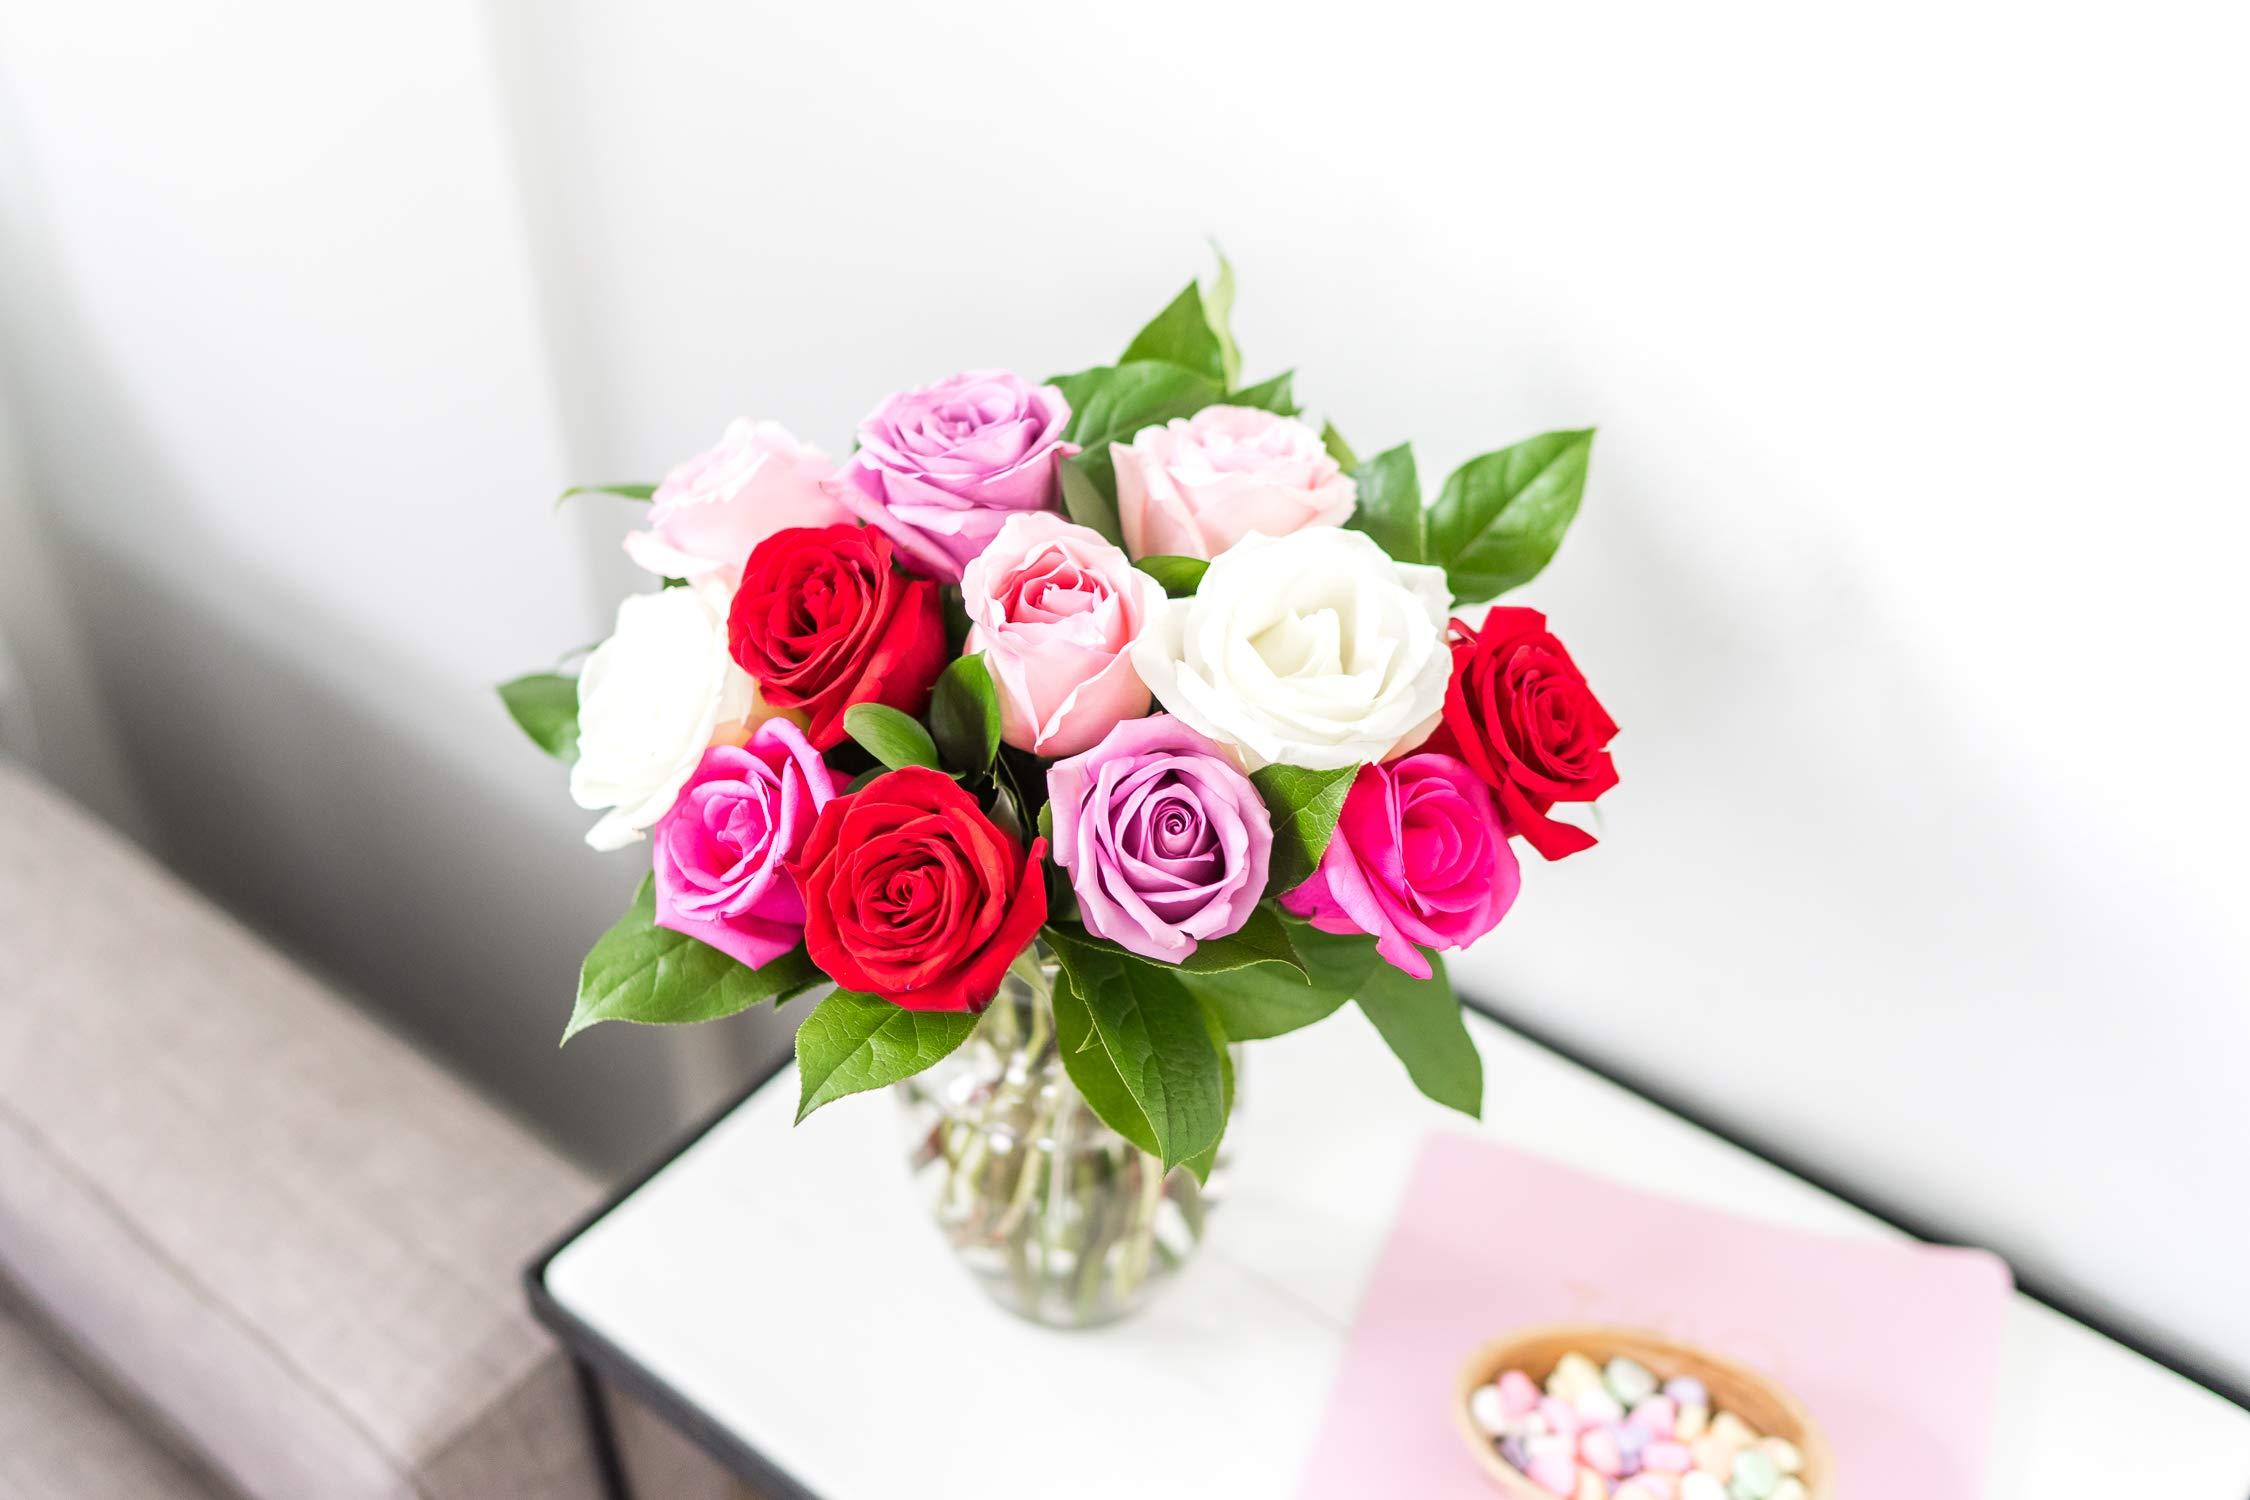 Flowers - One Dozen Assorted Sweetheart Roses with Godiva & Bear (Free Vase Included)